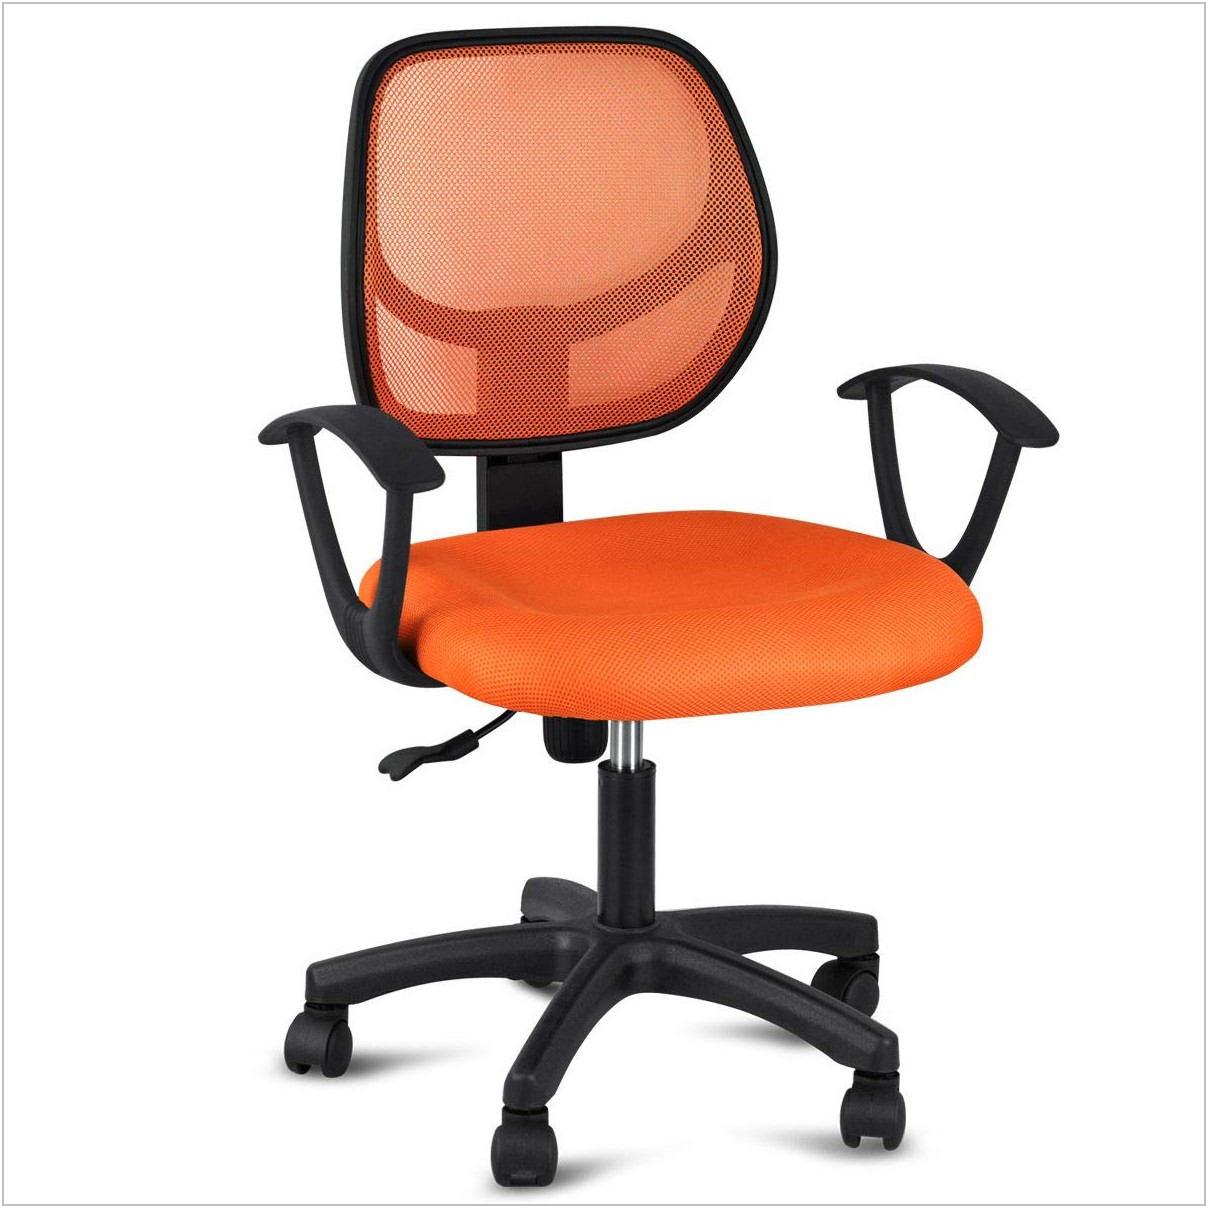 Orange Dining Room Chairs Set Of 4